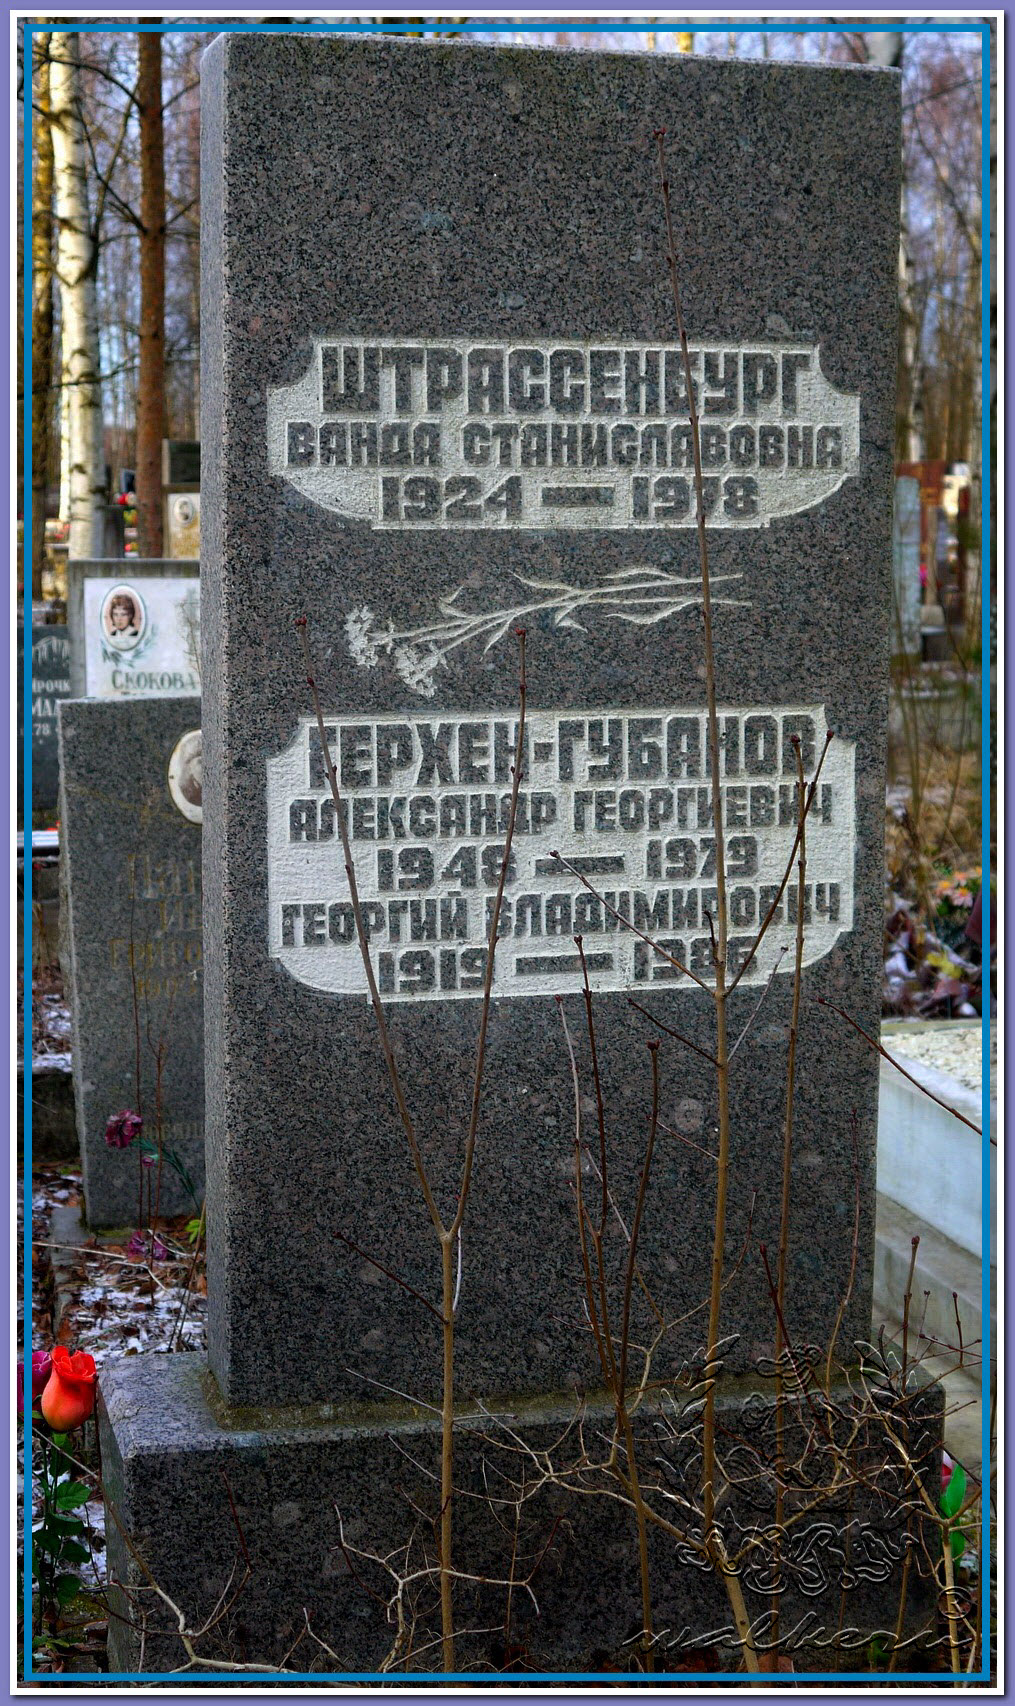 Герхен-Губанов Александр Георгиевич